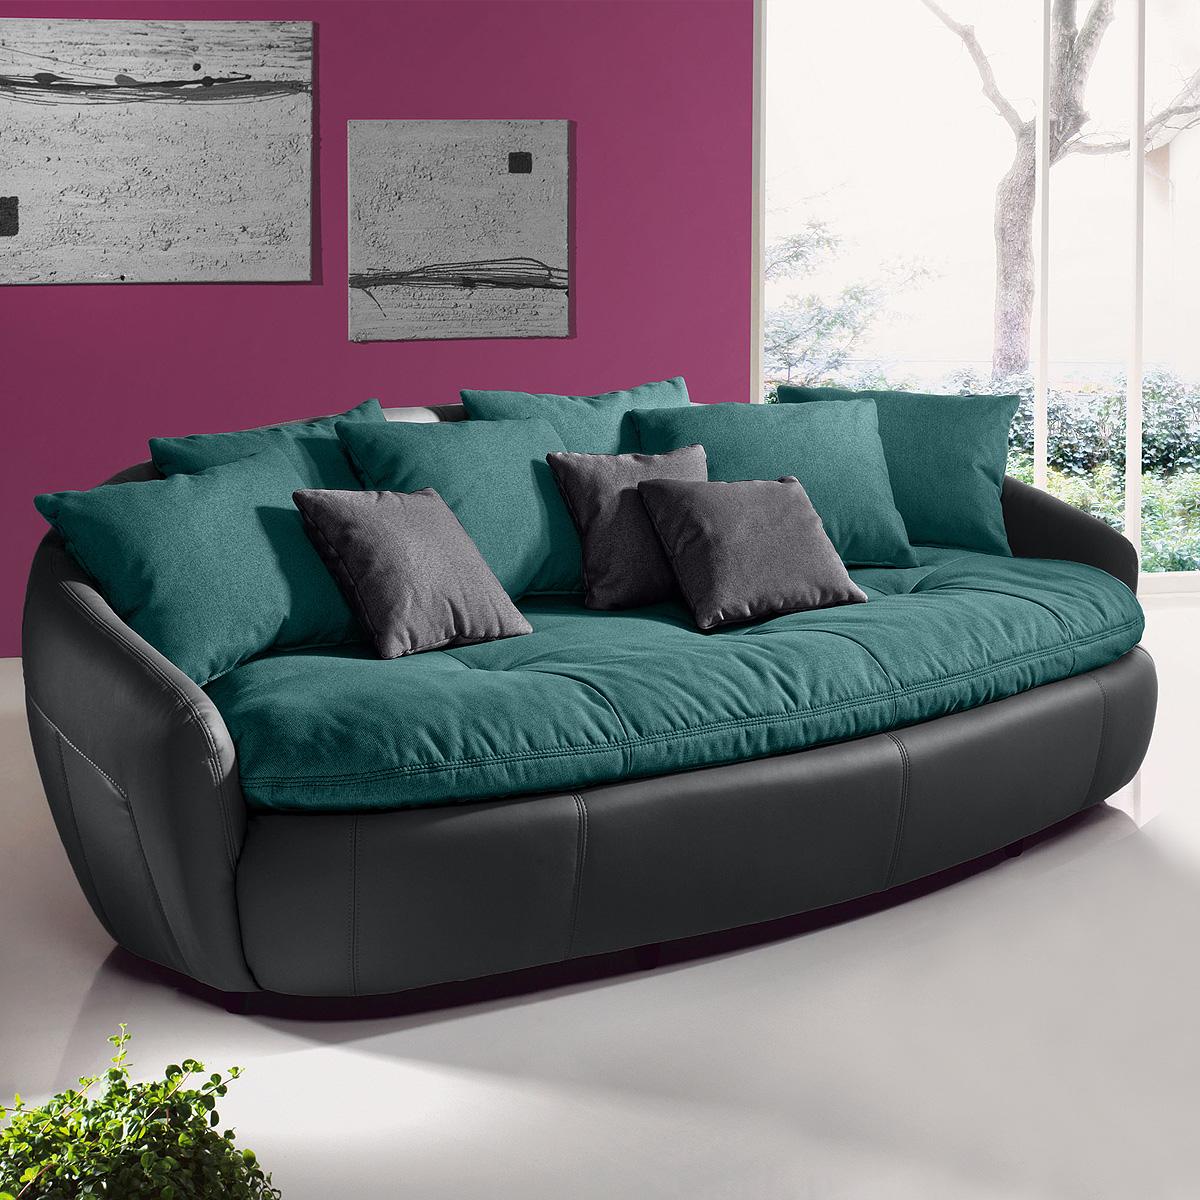 Couch Petrol Best Couch Petrol With Couch Petrol Affordable Ilona